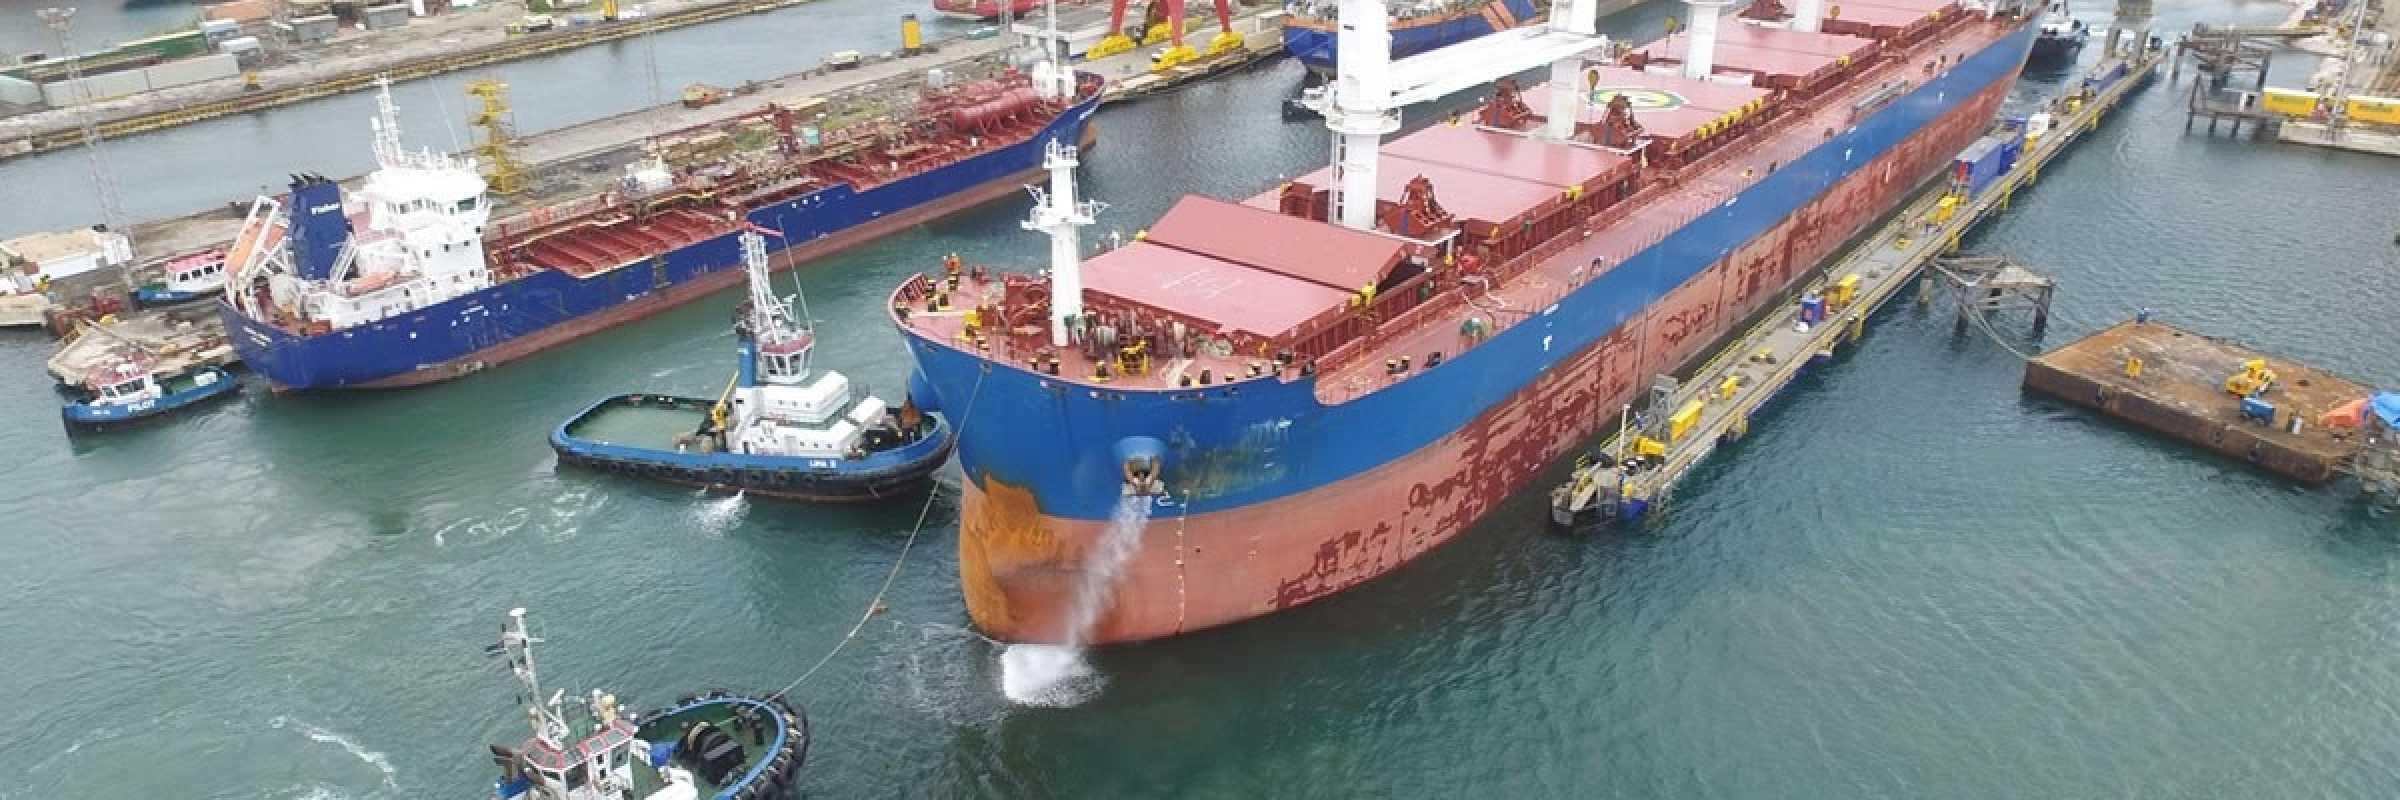 Damen adds new drydock capacity in Caribbean